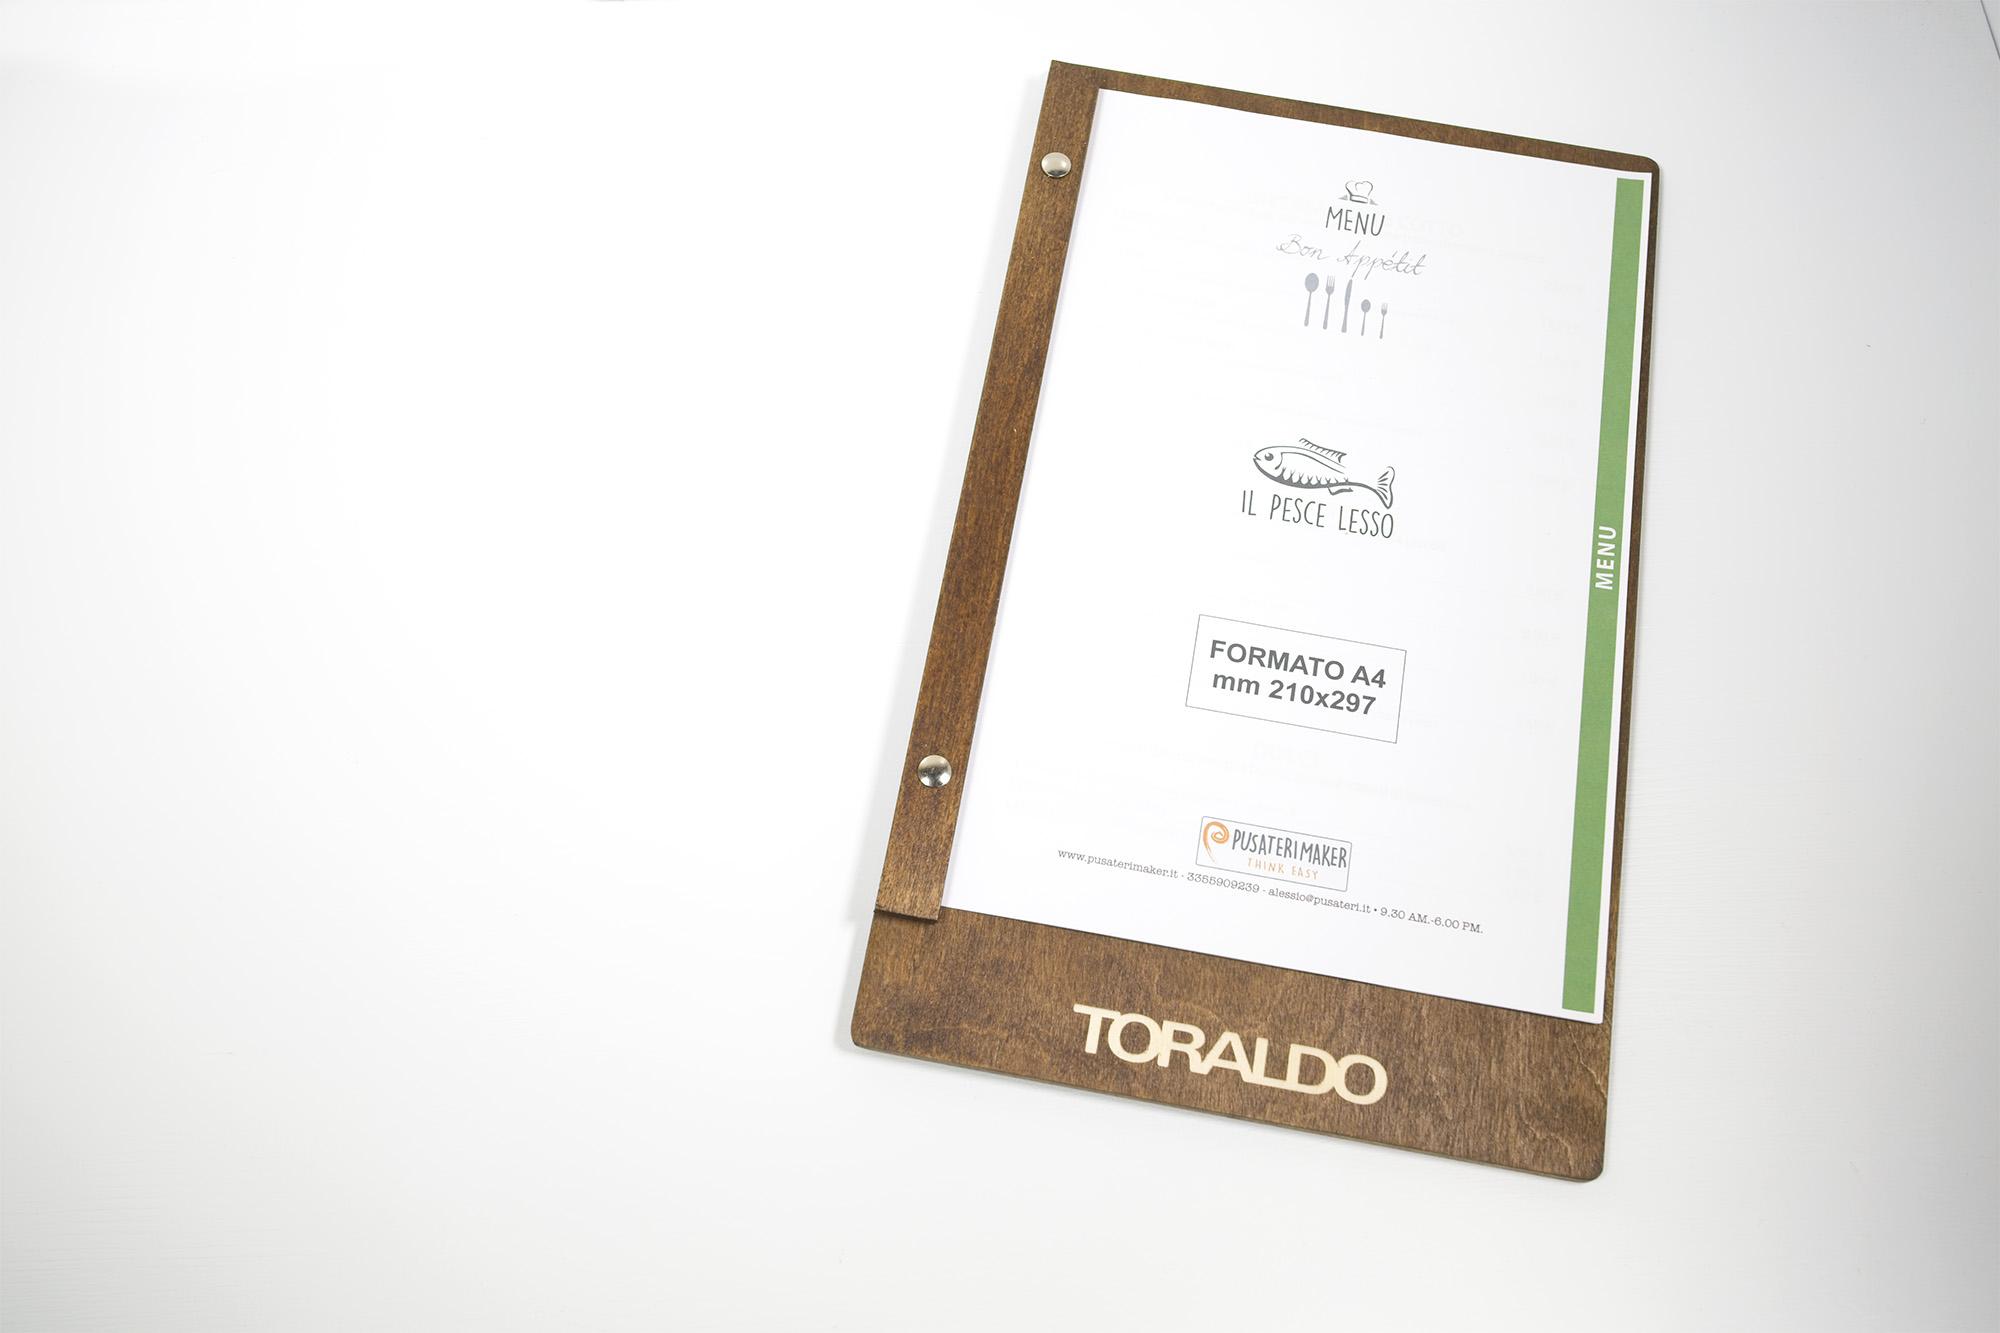 Portamenu Borgo Nuovo Caffè Toraldo